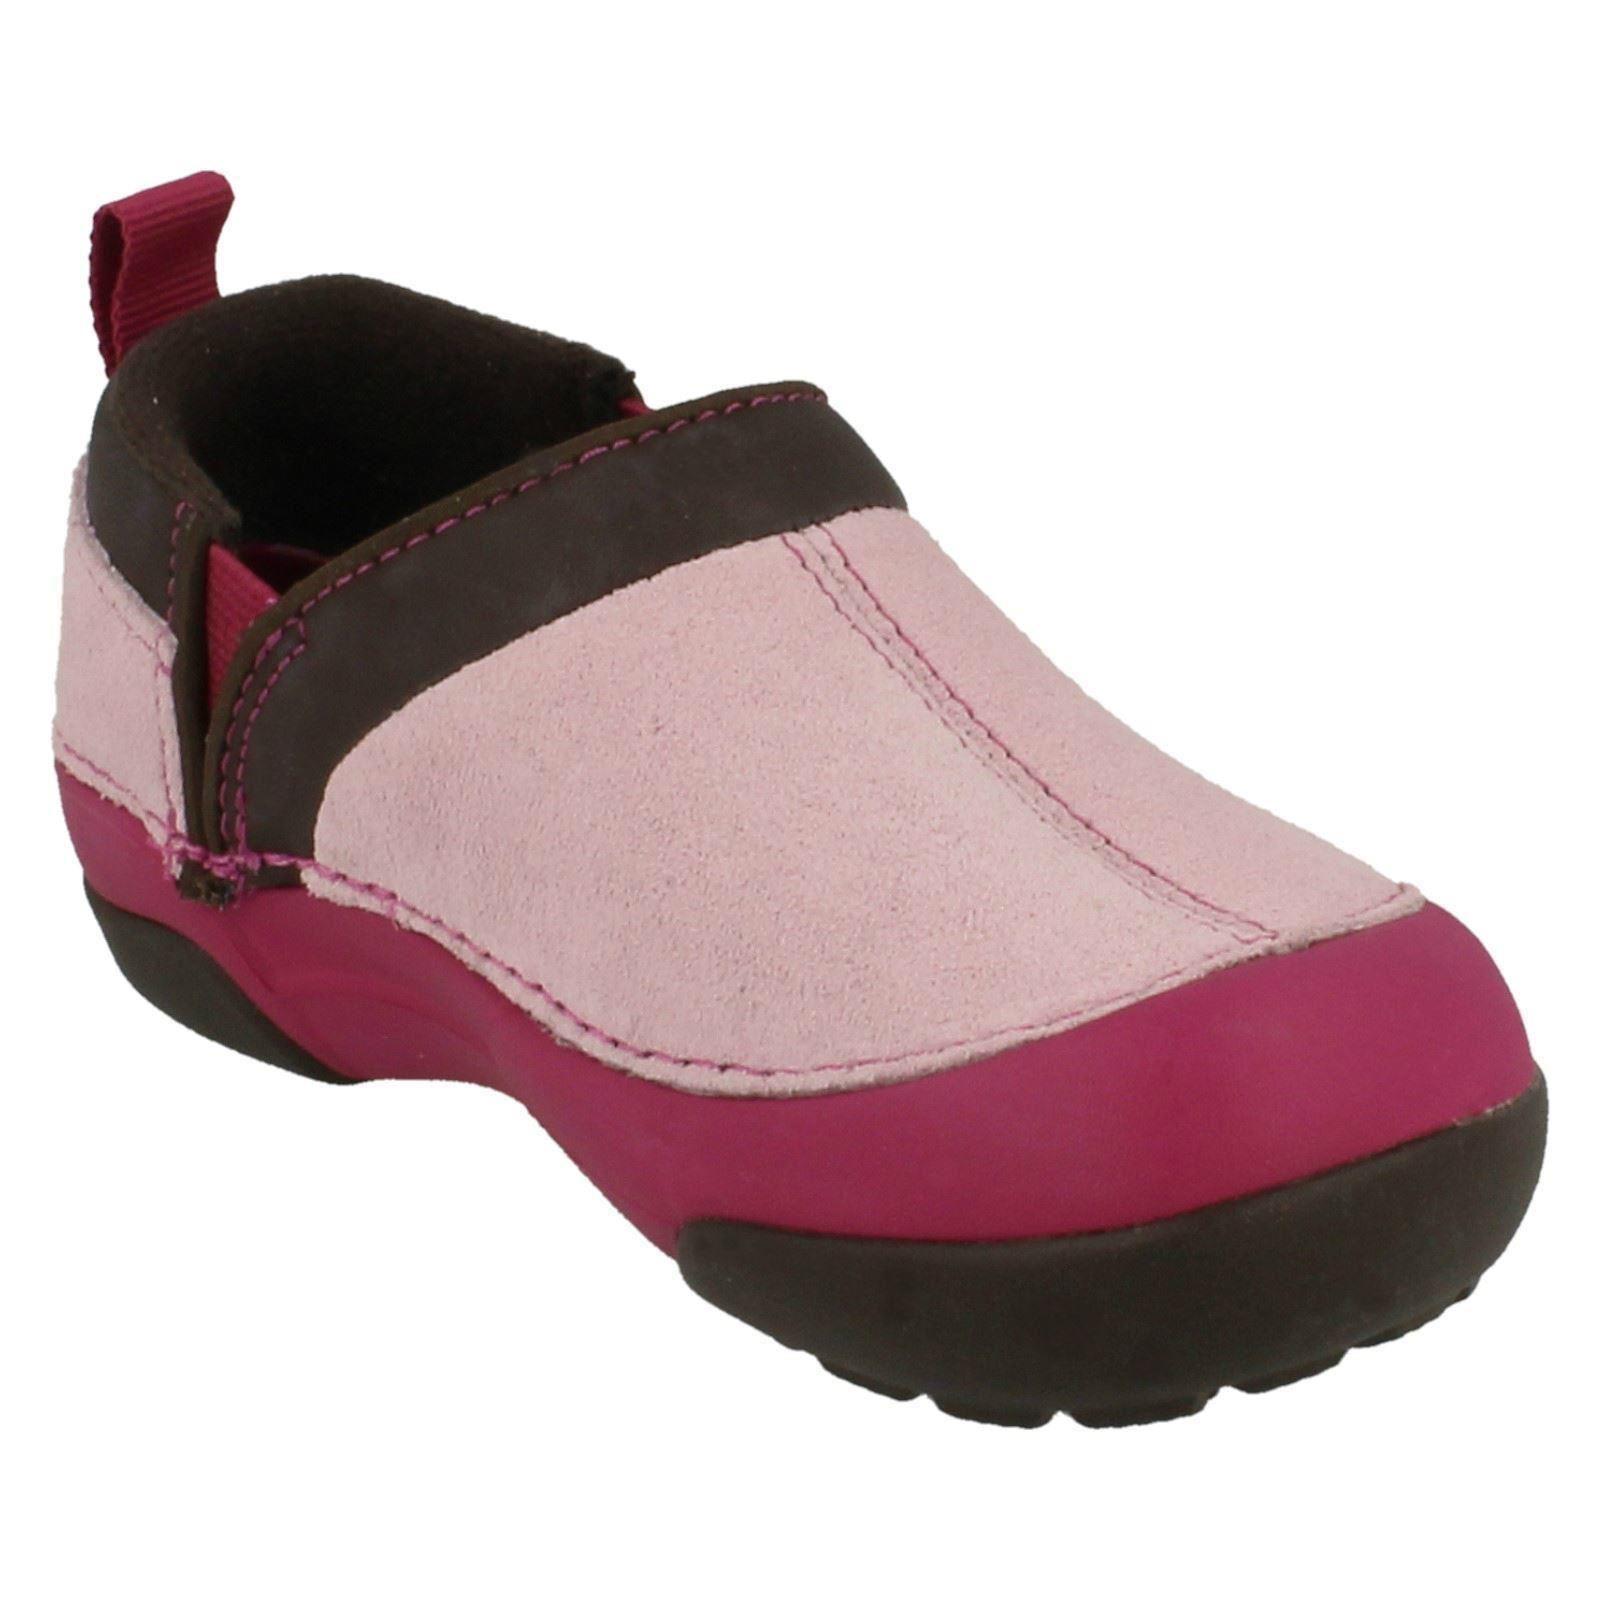 Niñas Crocs Slip On Zapato astucia Cameron Kids ~ N